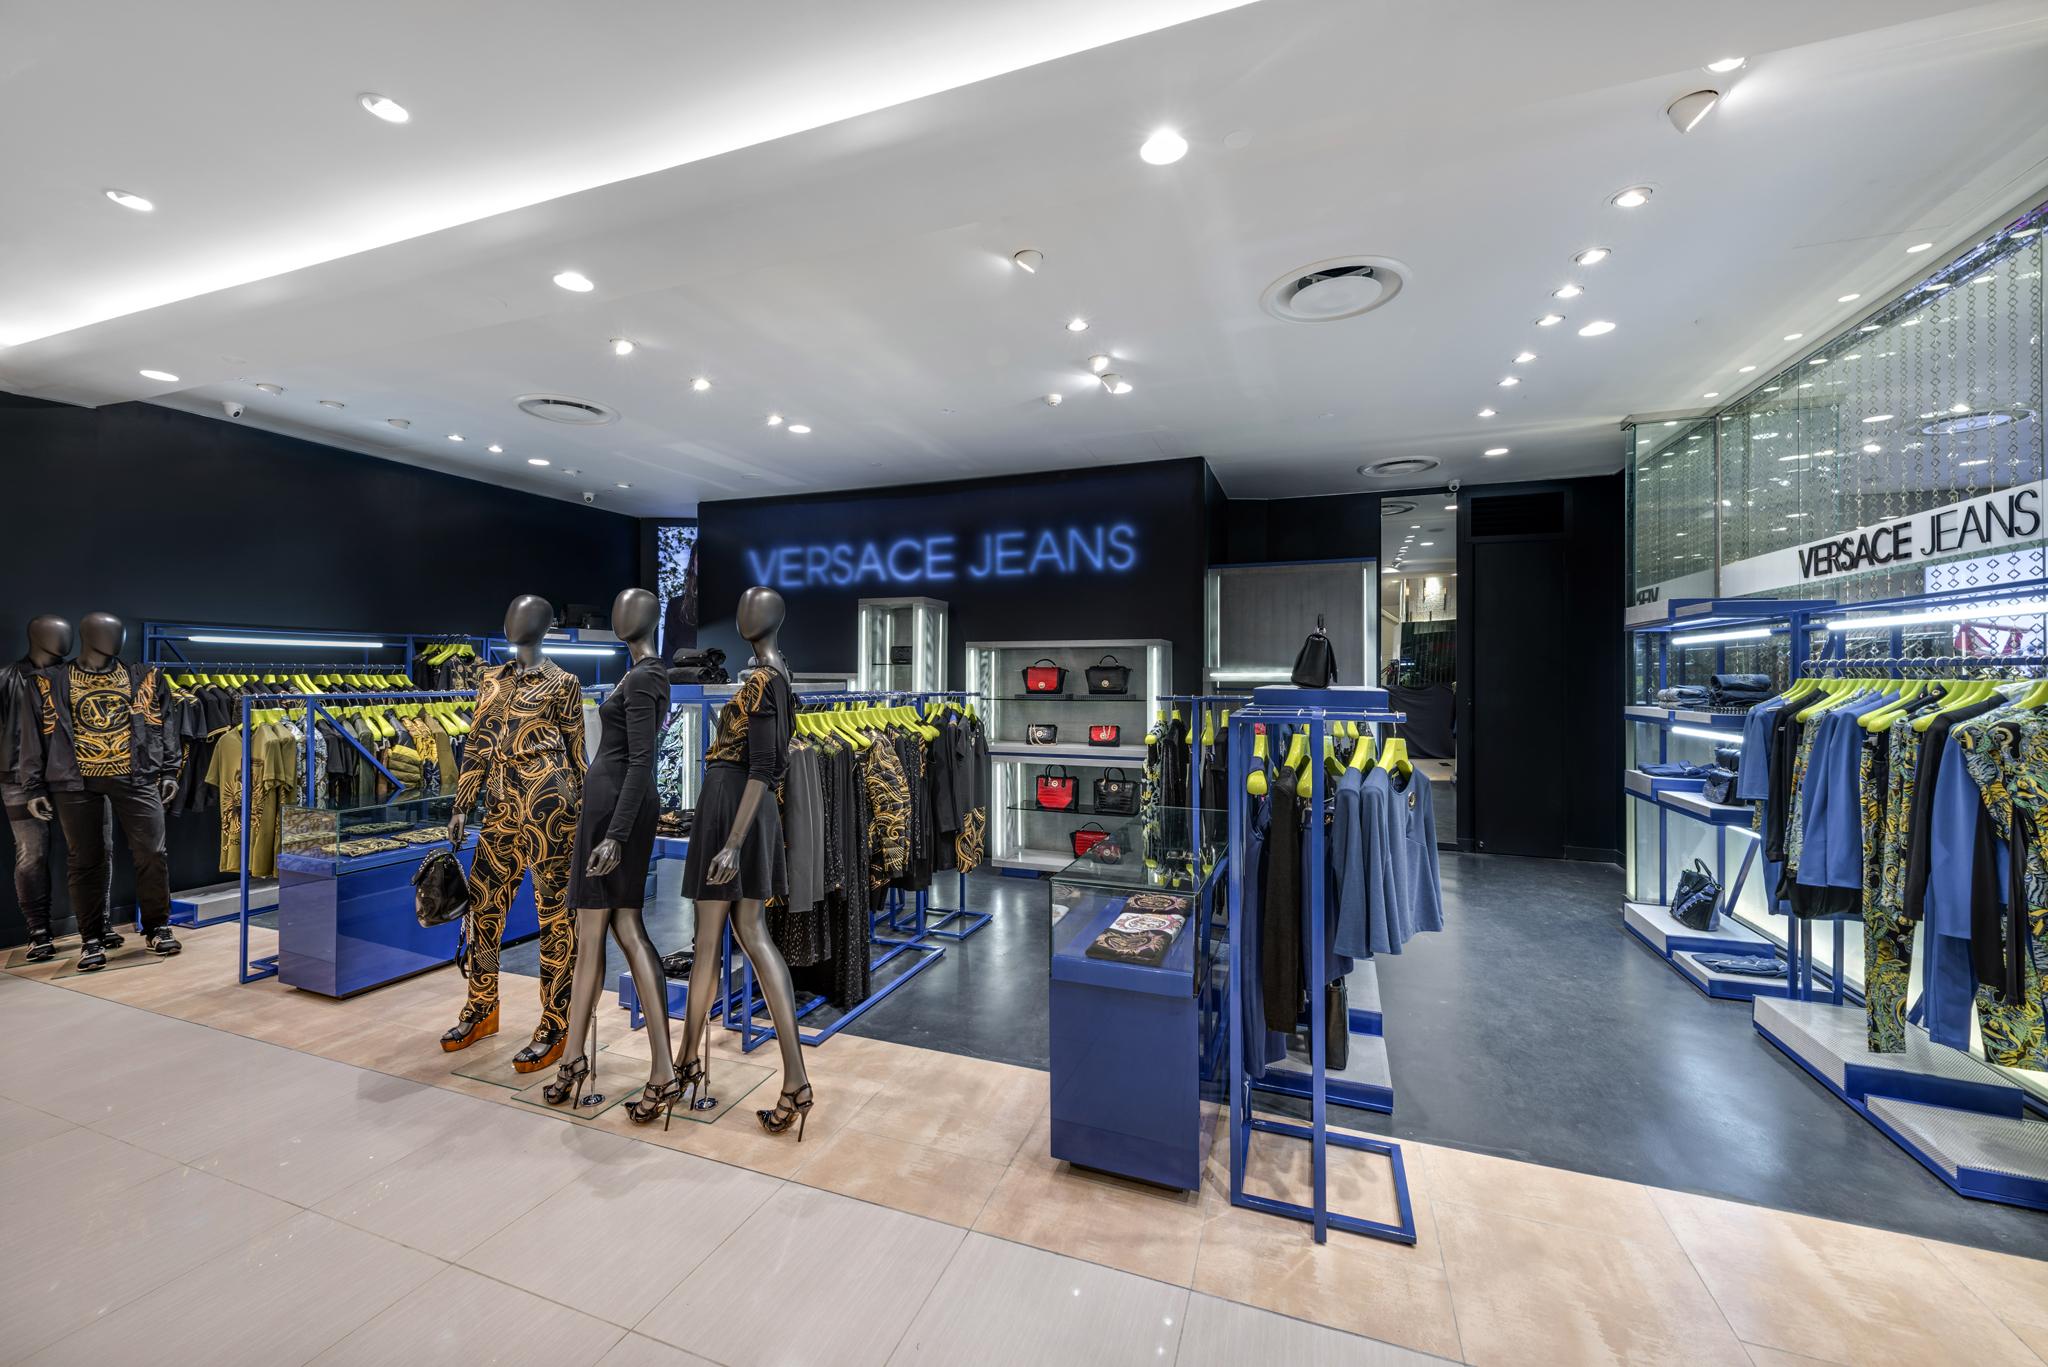 20160729 - Versace Jean - HCM - Commercial - Interior - Store - Retouch 0002.jpg